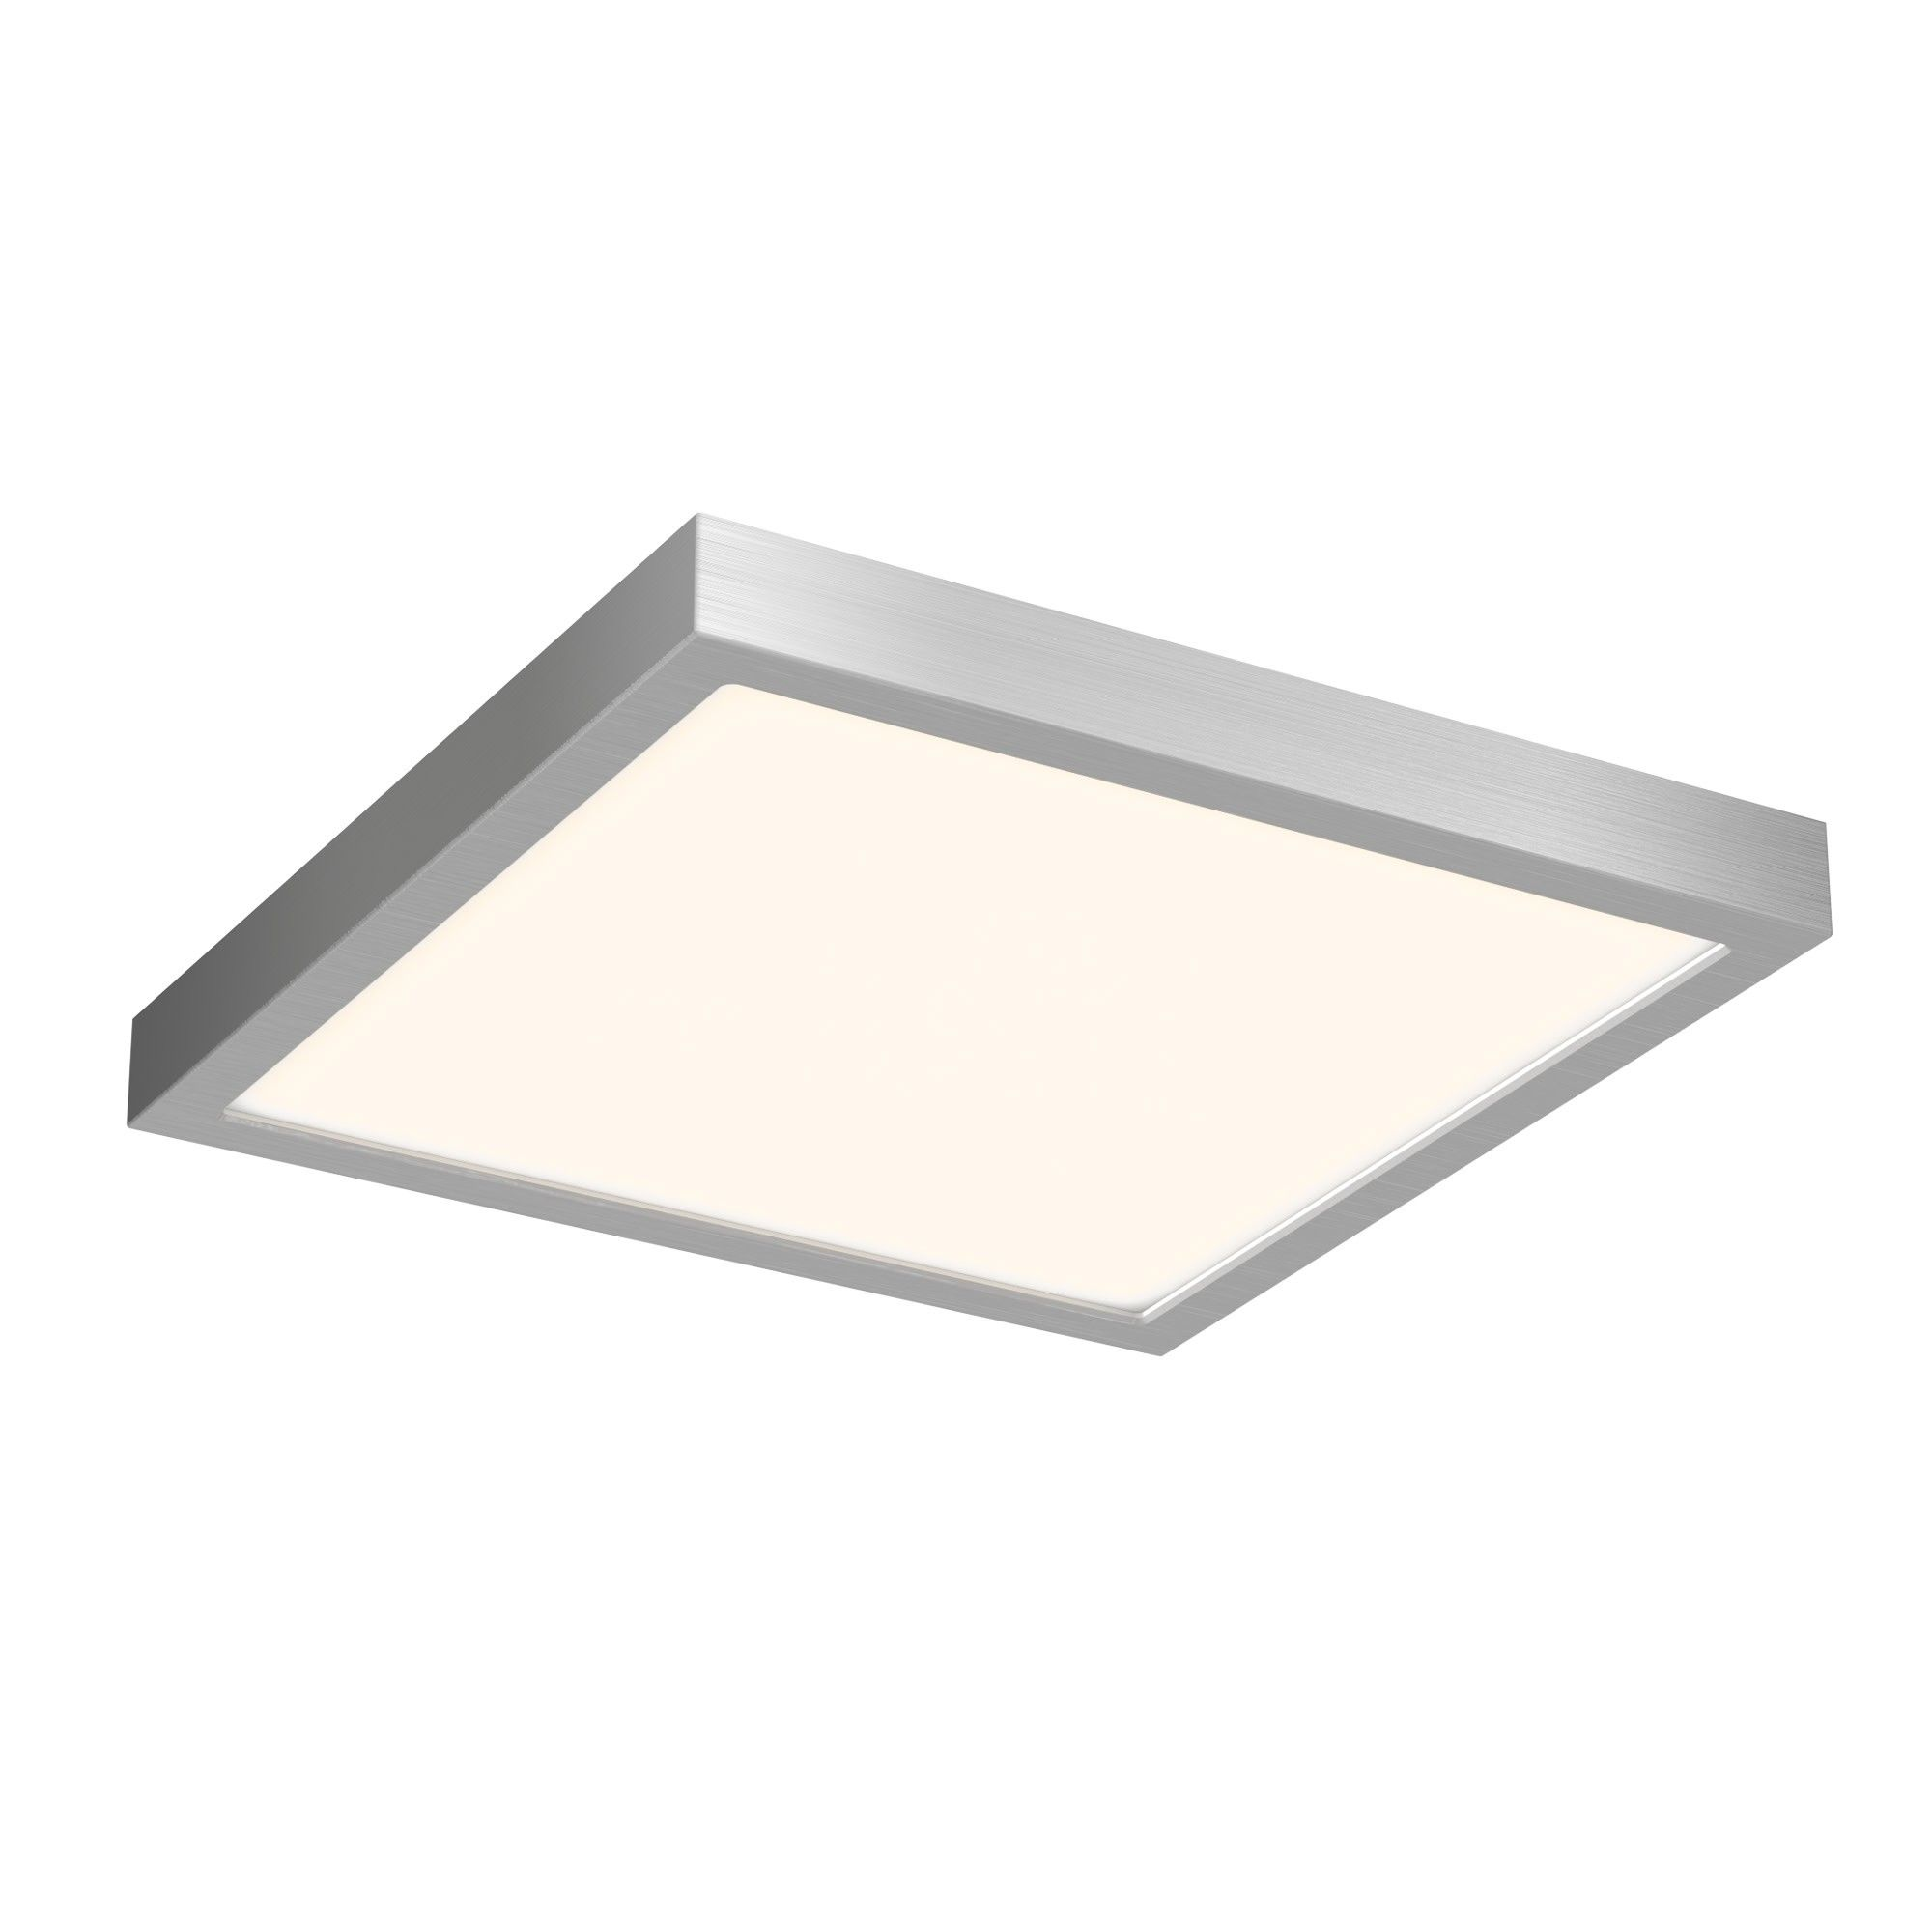 Dals Lighting Cfledsq10 Indoor Outdoor 10 Wide Led Square Flush